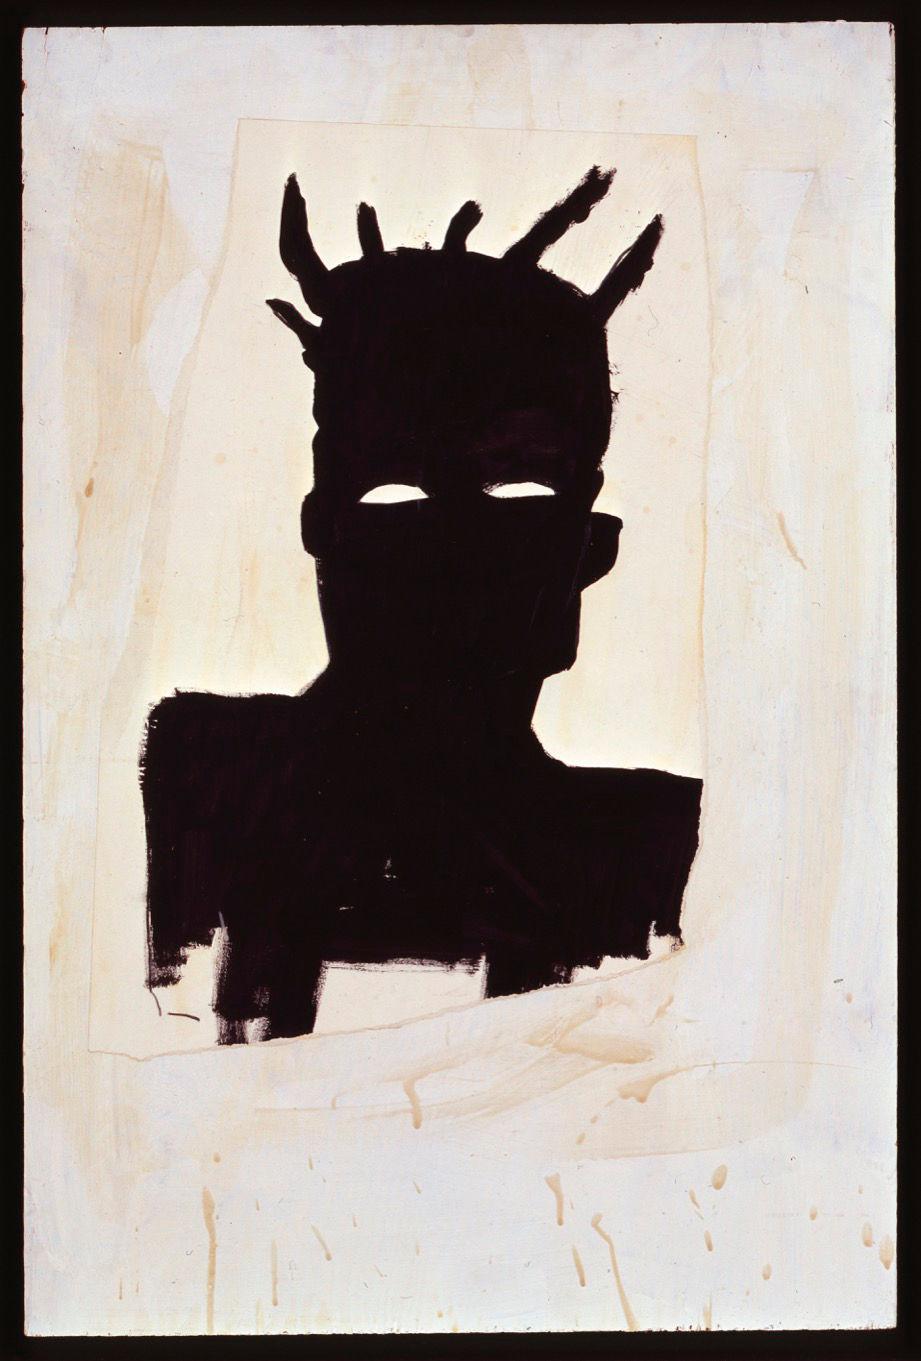 Jean-Michel Basquiat, Self Portrait, 1983. Oil on paper and wood 91.5 x 61 cm (36.0 x 24.0 in) Collection Thaddaeus Ropac © The Estate of Jean-Michel Basquiat / ADAGP, Paris and DACS, London 2019. Collection Thaddaeus Ropac. Photo: Stephen White